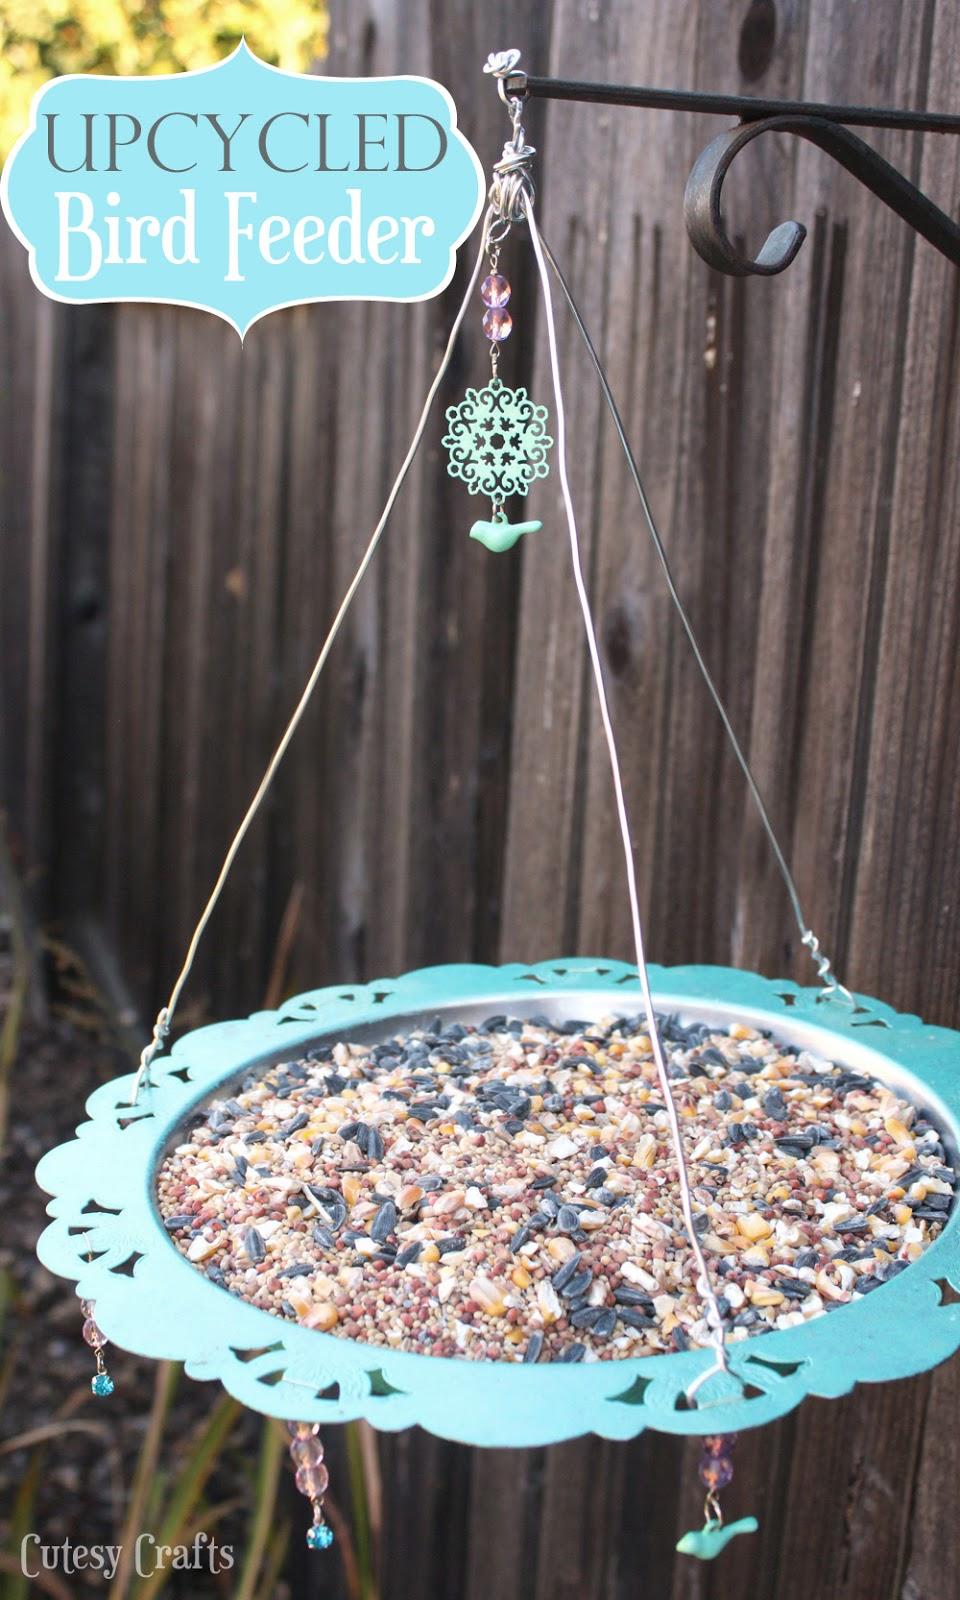 Upcycled bird feeder cutesy crafts for Upcycled bird feeder